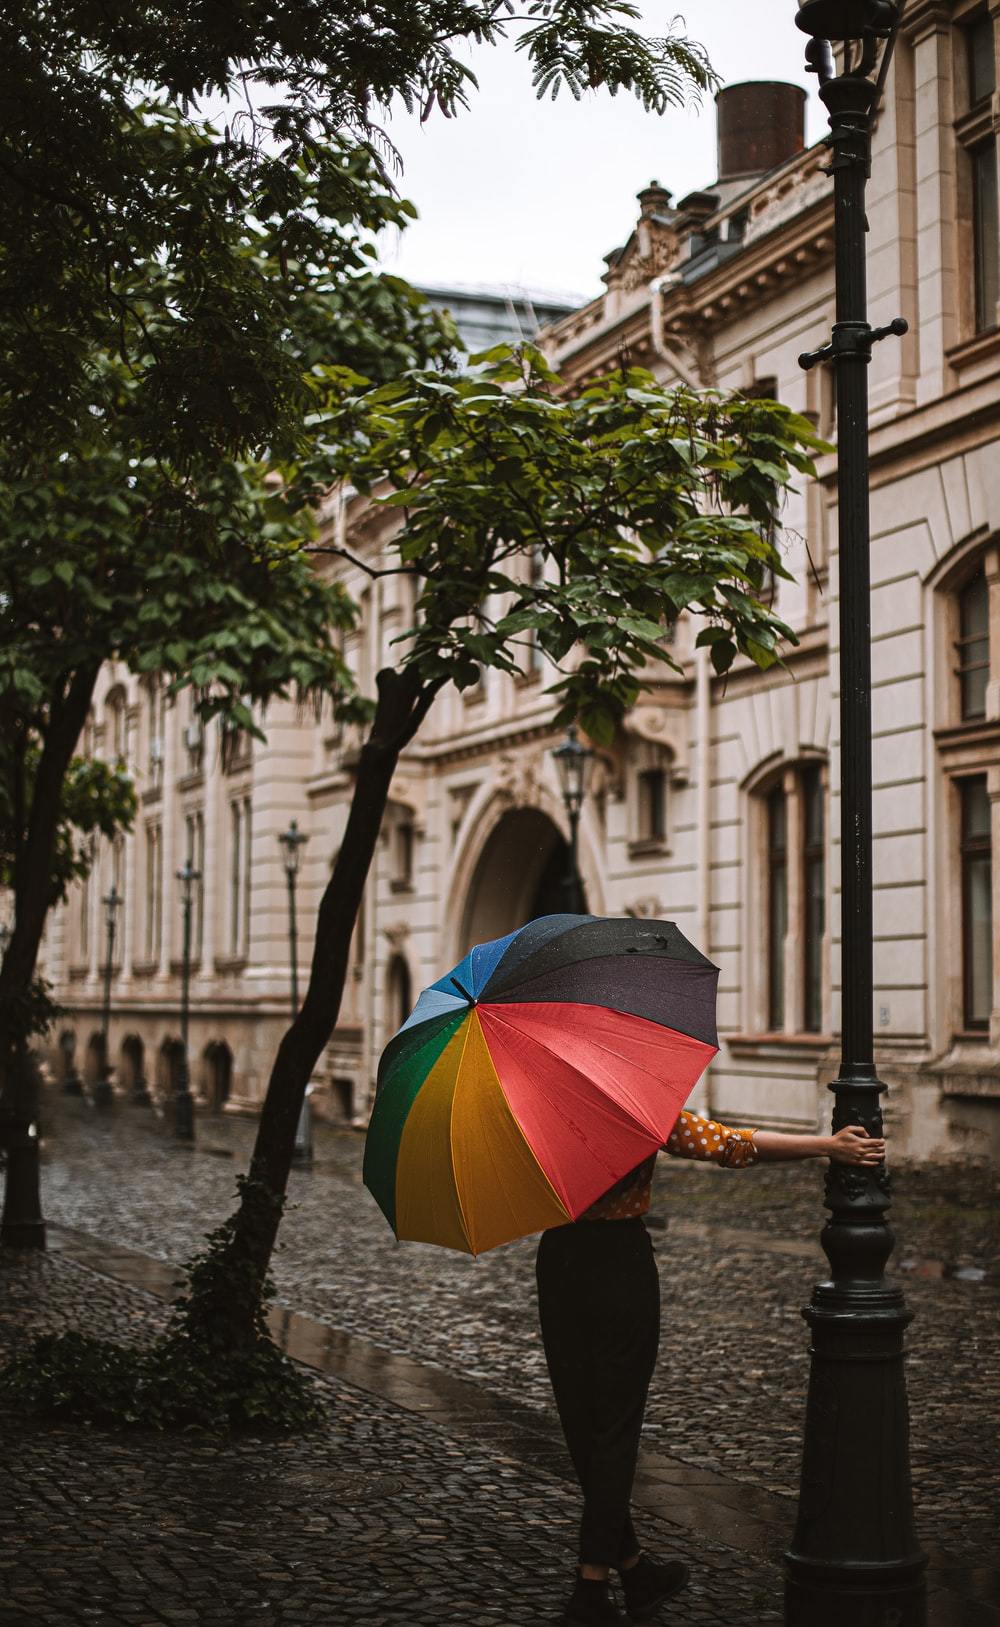 person holding umbrella walking on sidewalk during daytime